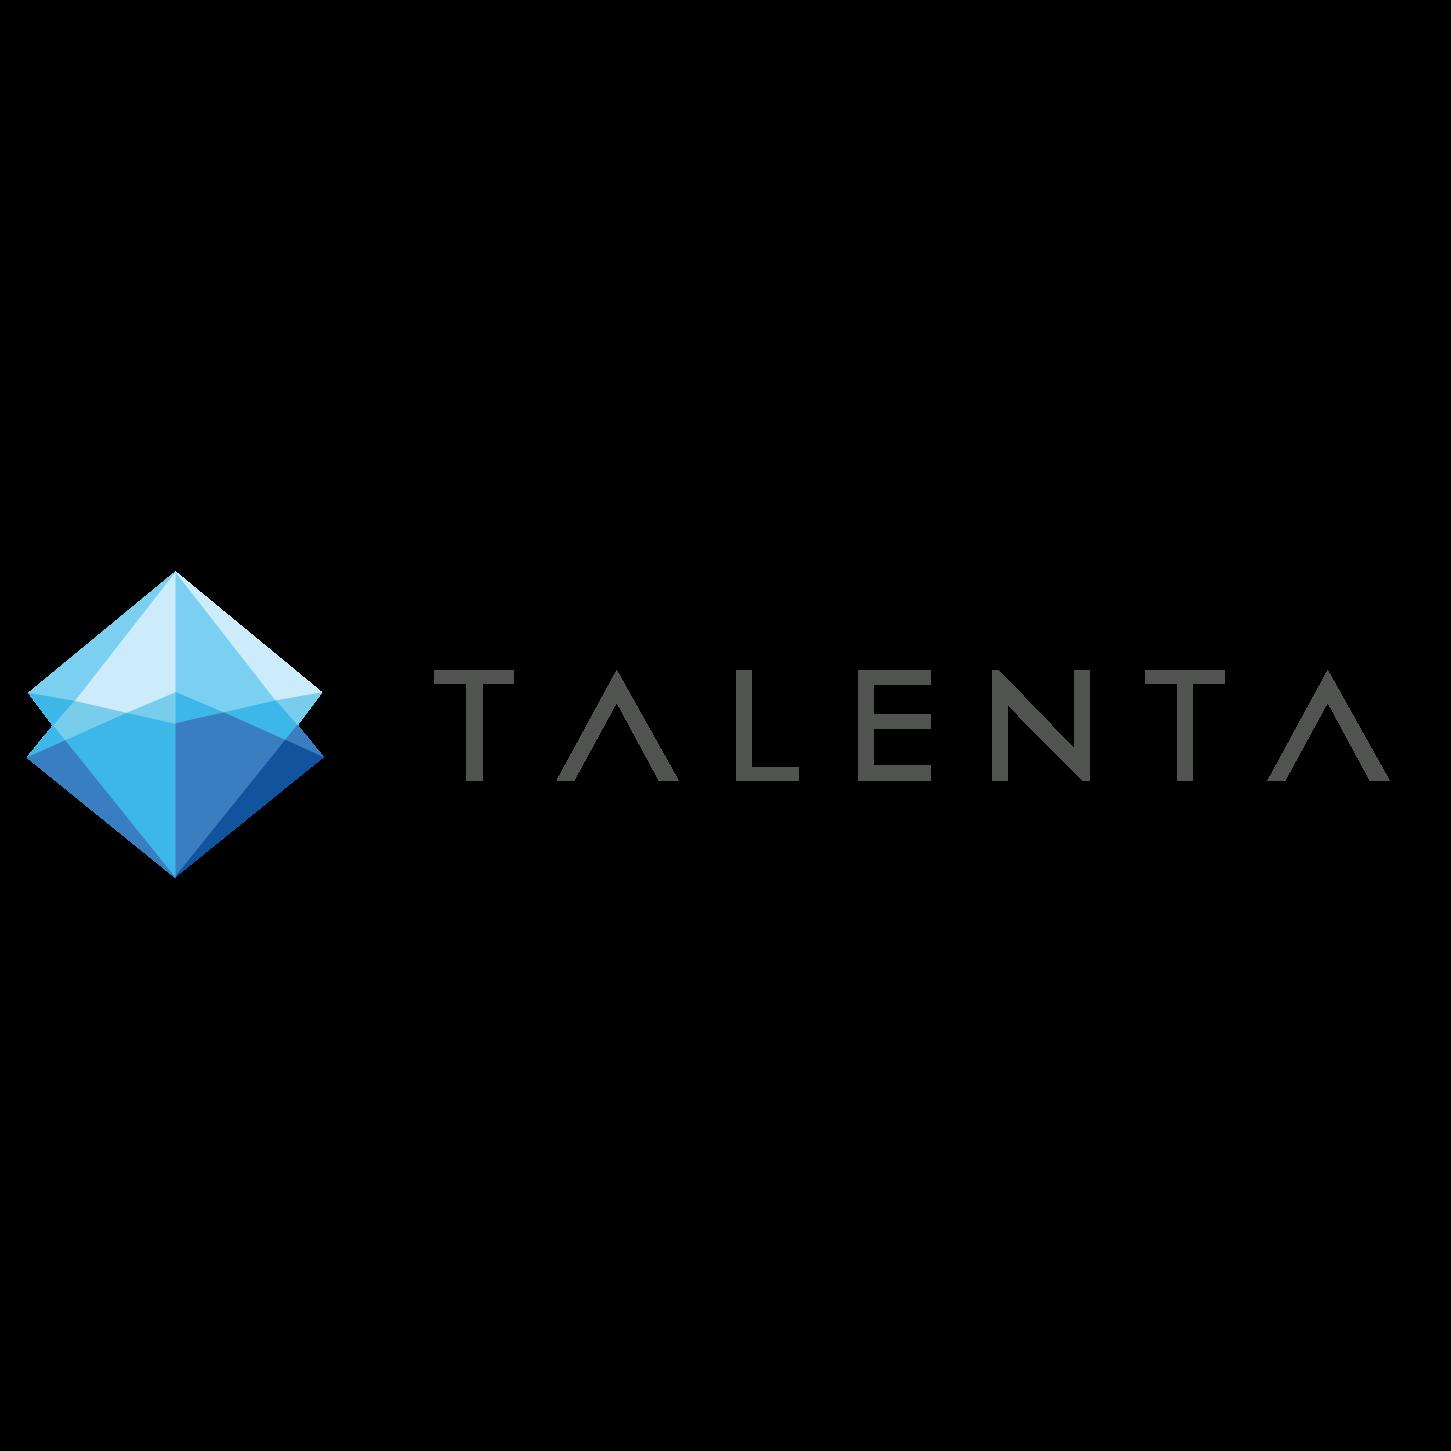 The speaker works for Talenta Group